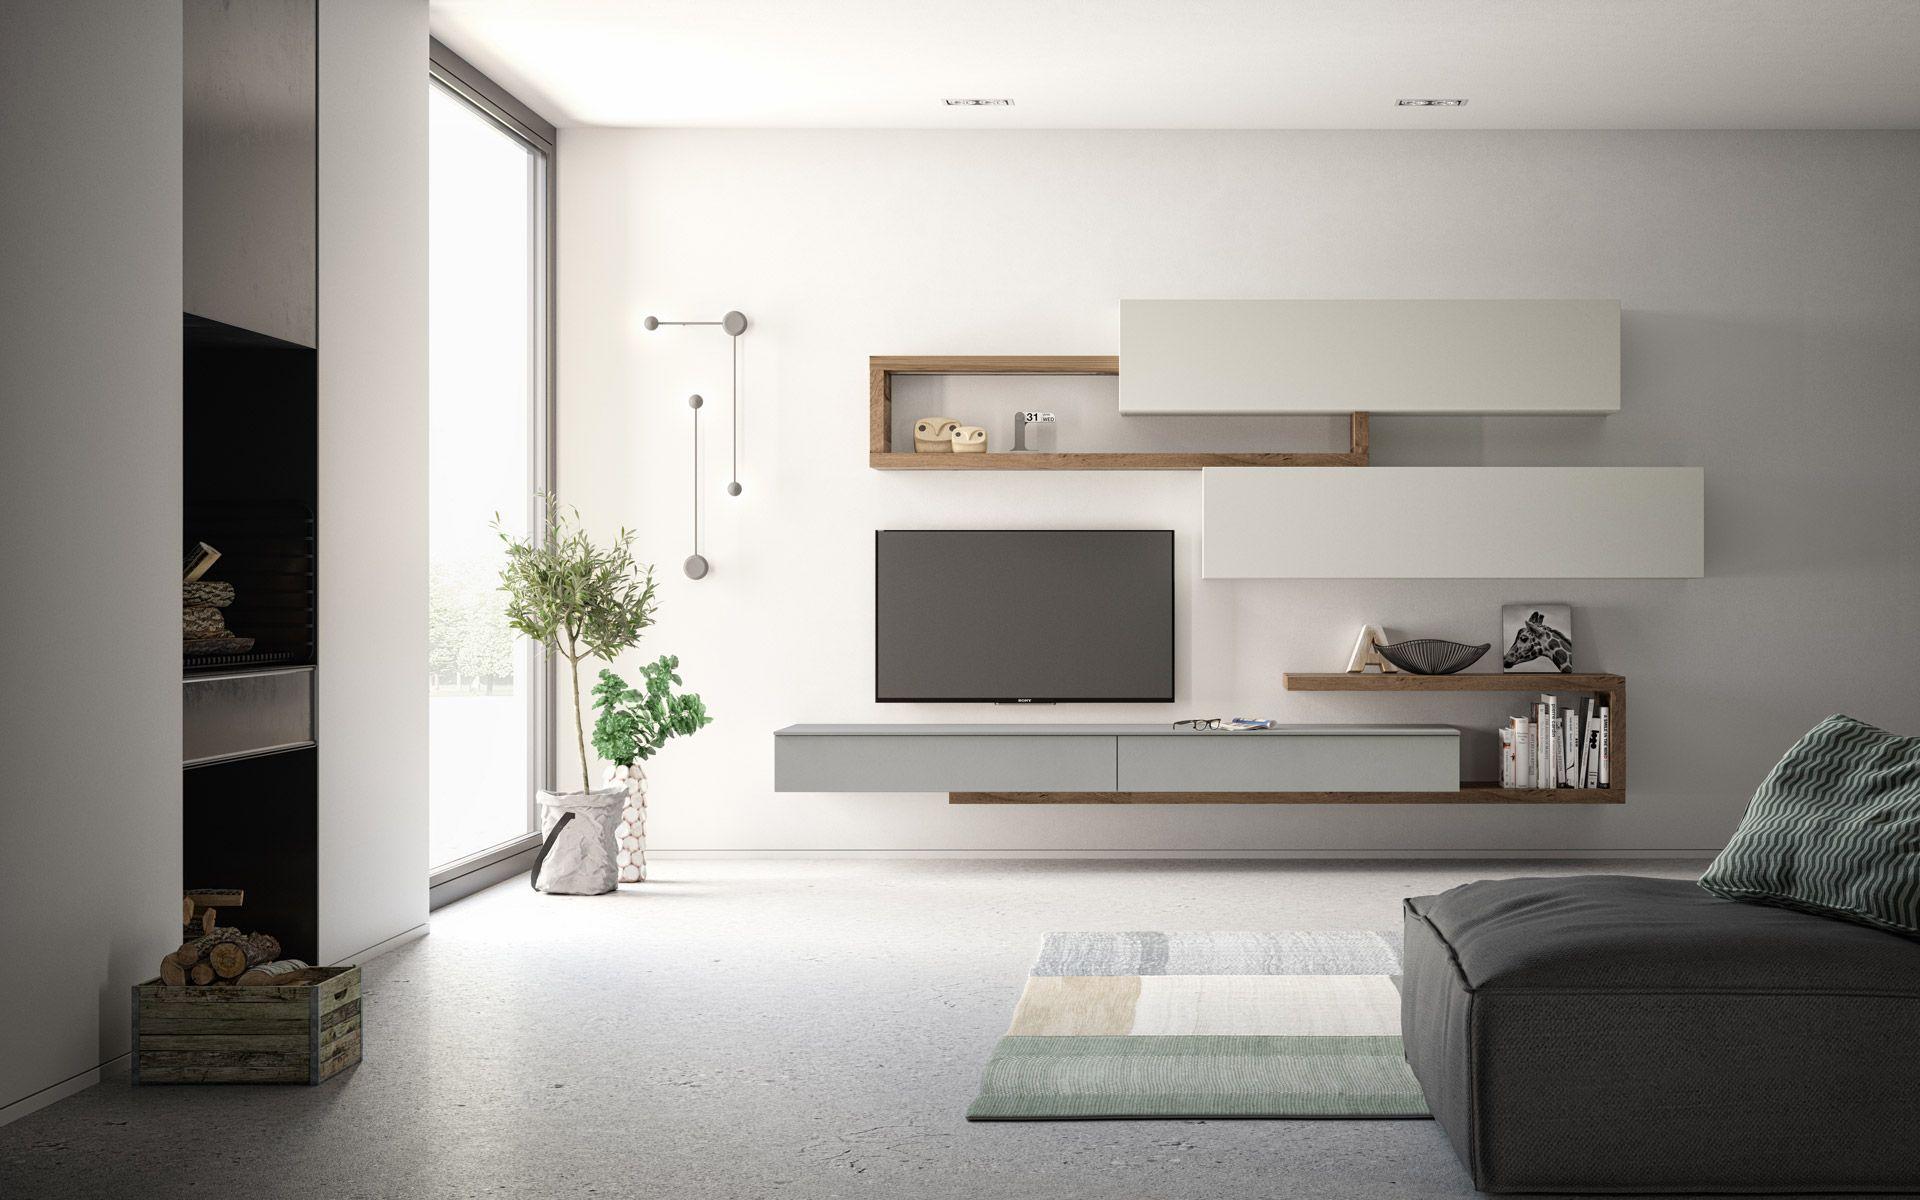 Vergani Home Divani Prezzi modern tv stand assortment offers a lot of different options